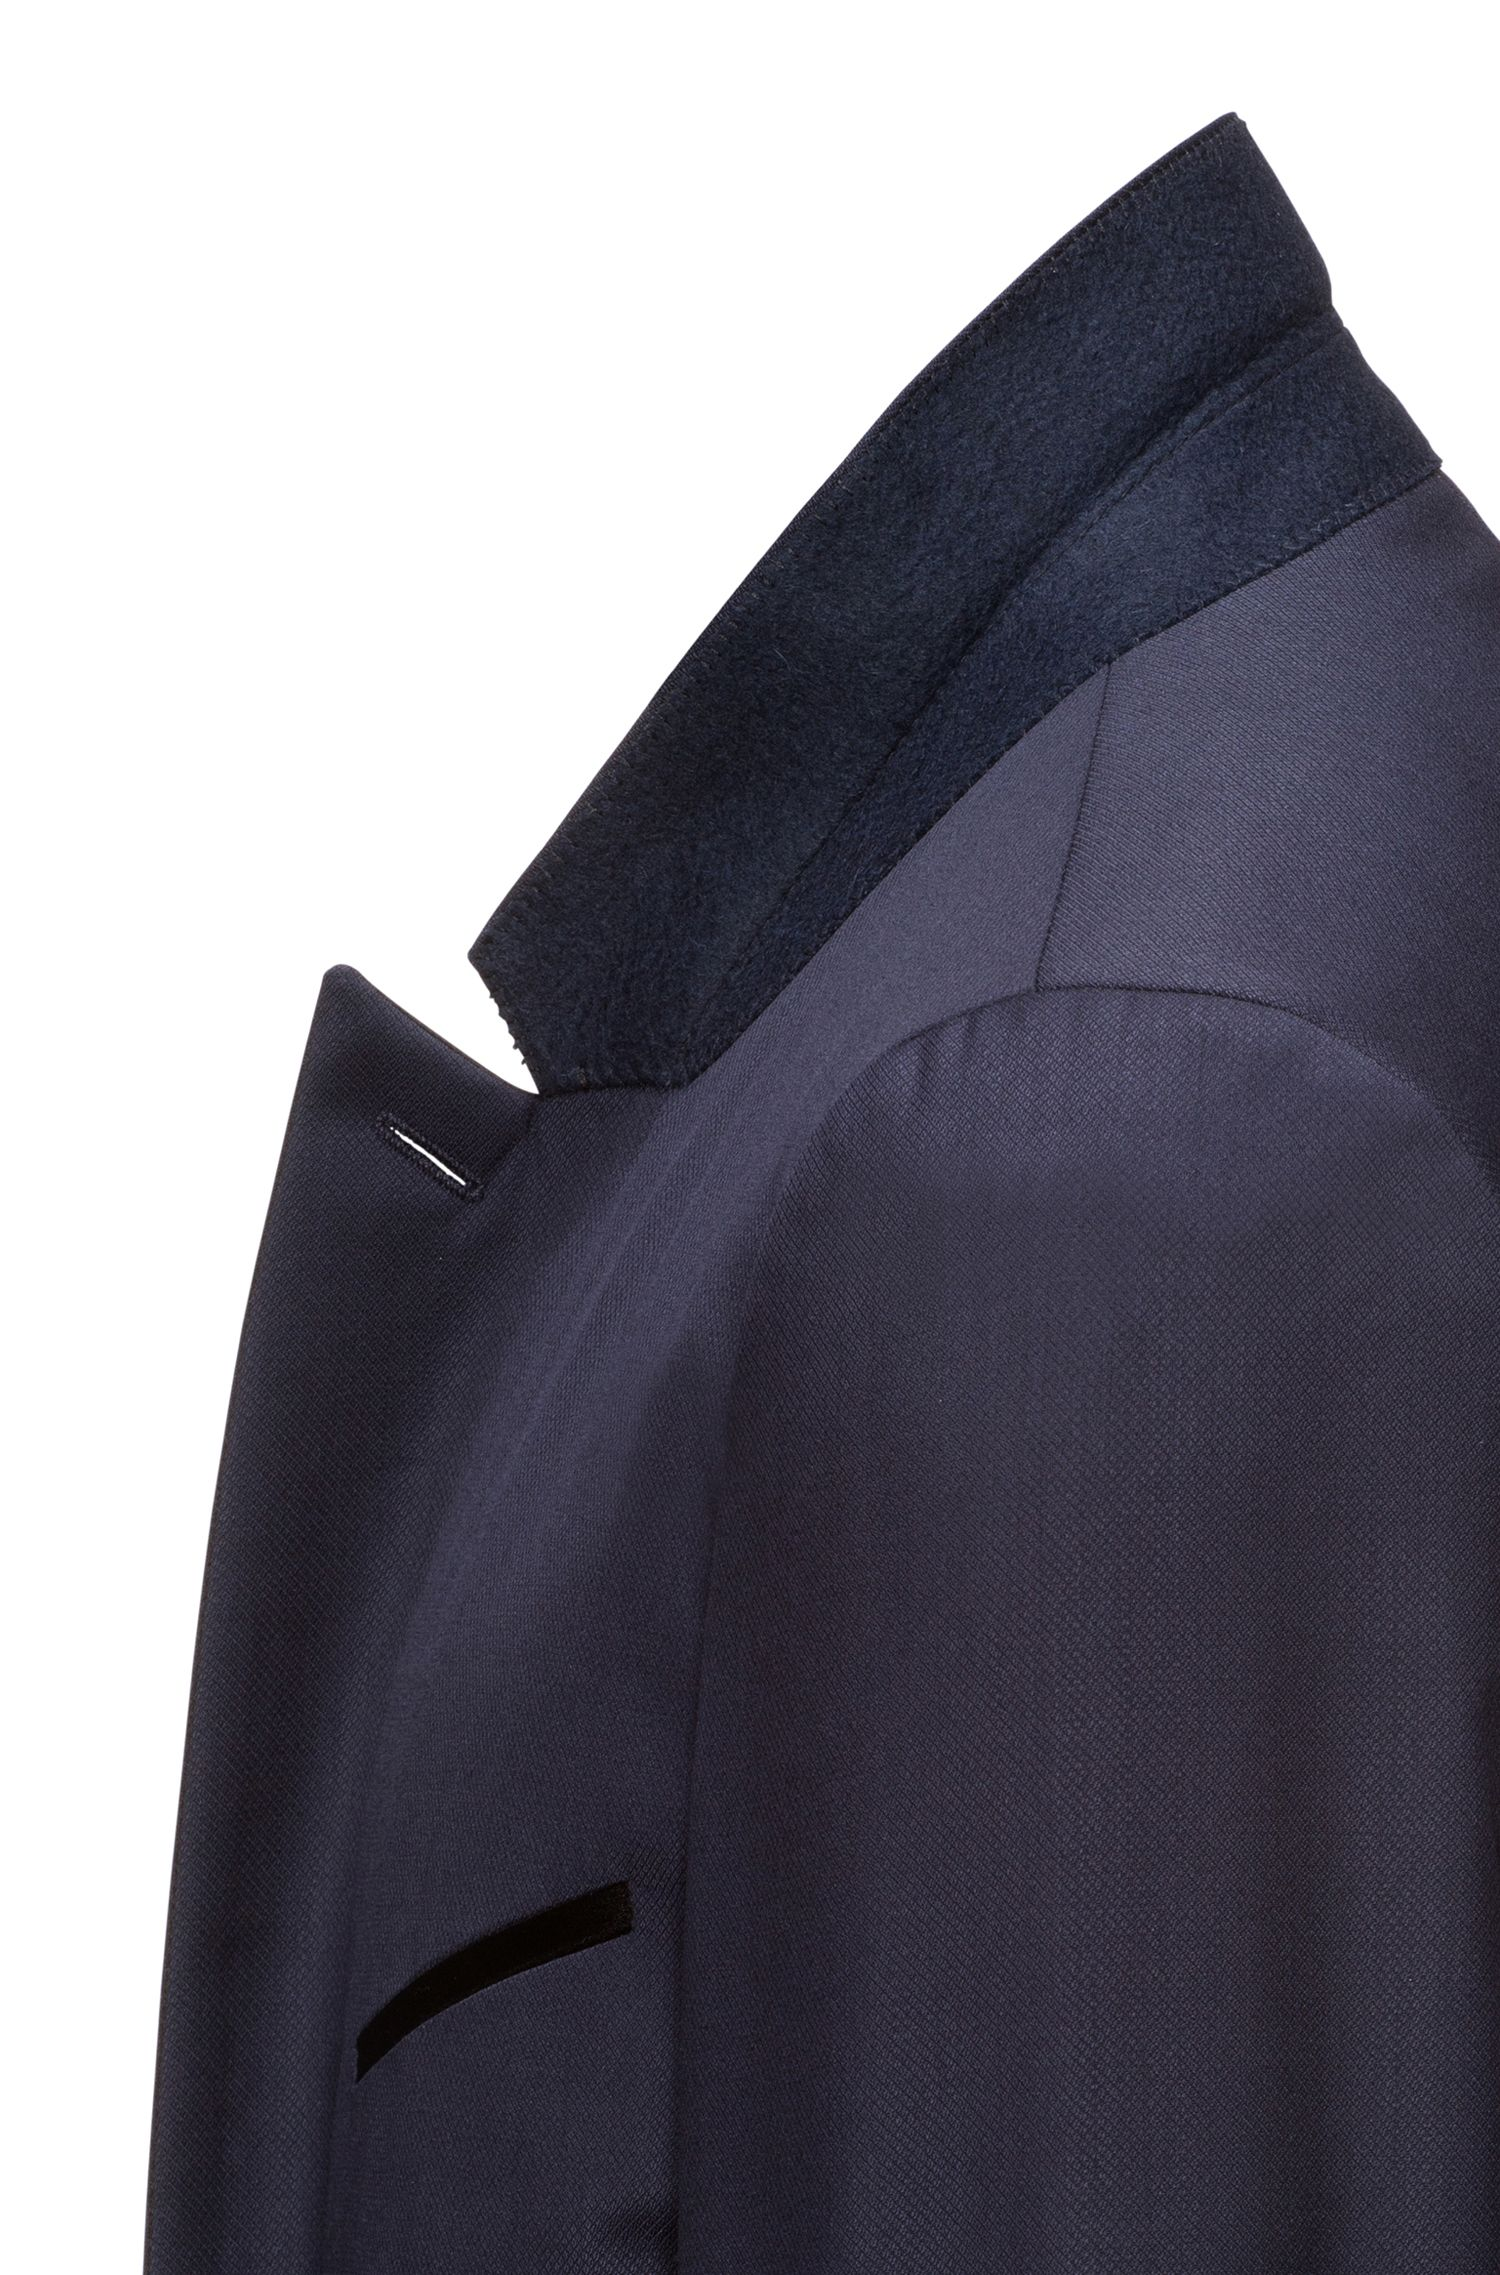 Wool Blend Tuxedo, Extra Slim Fit | Auerd/Himins, Dark Blue